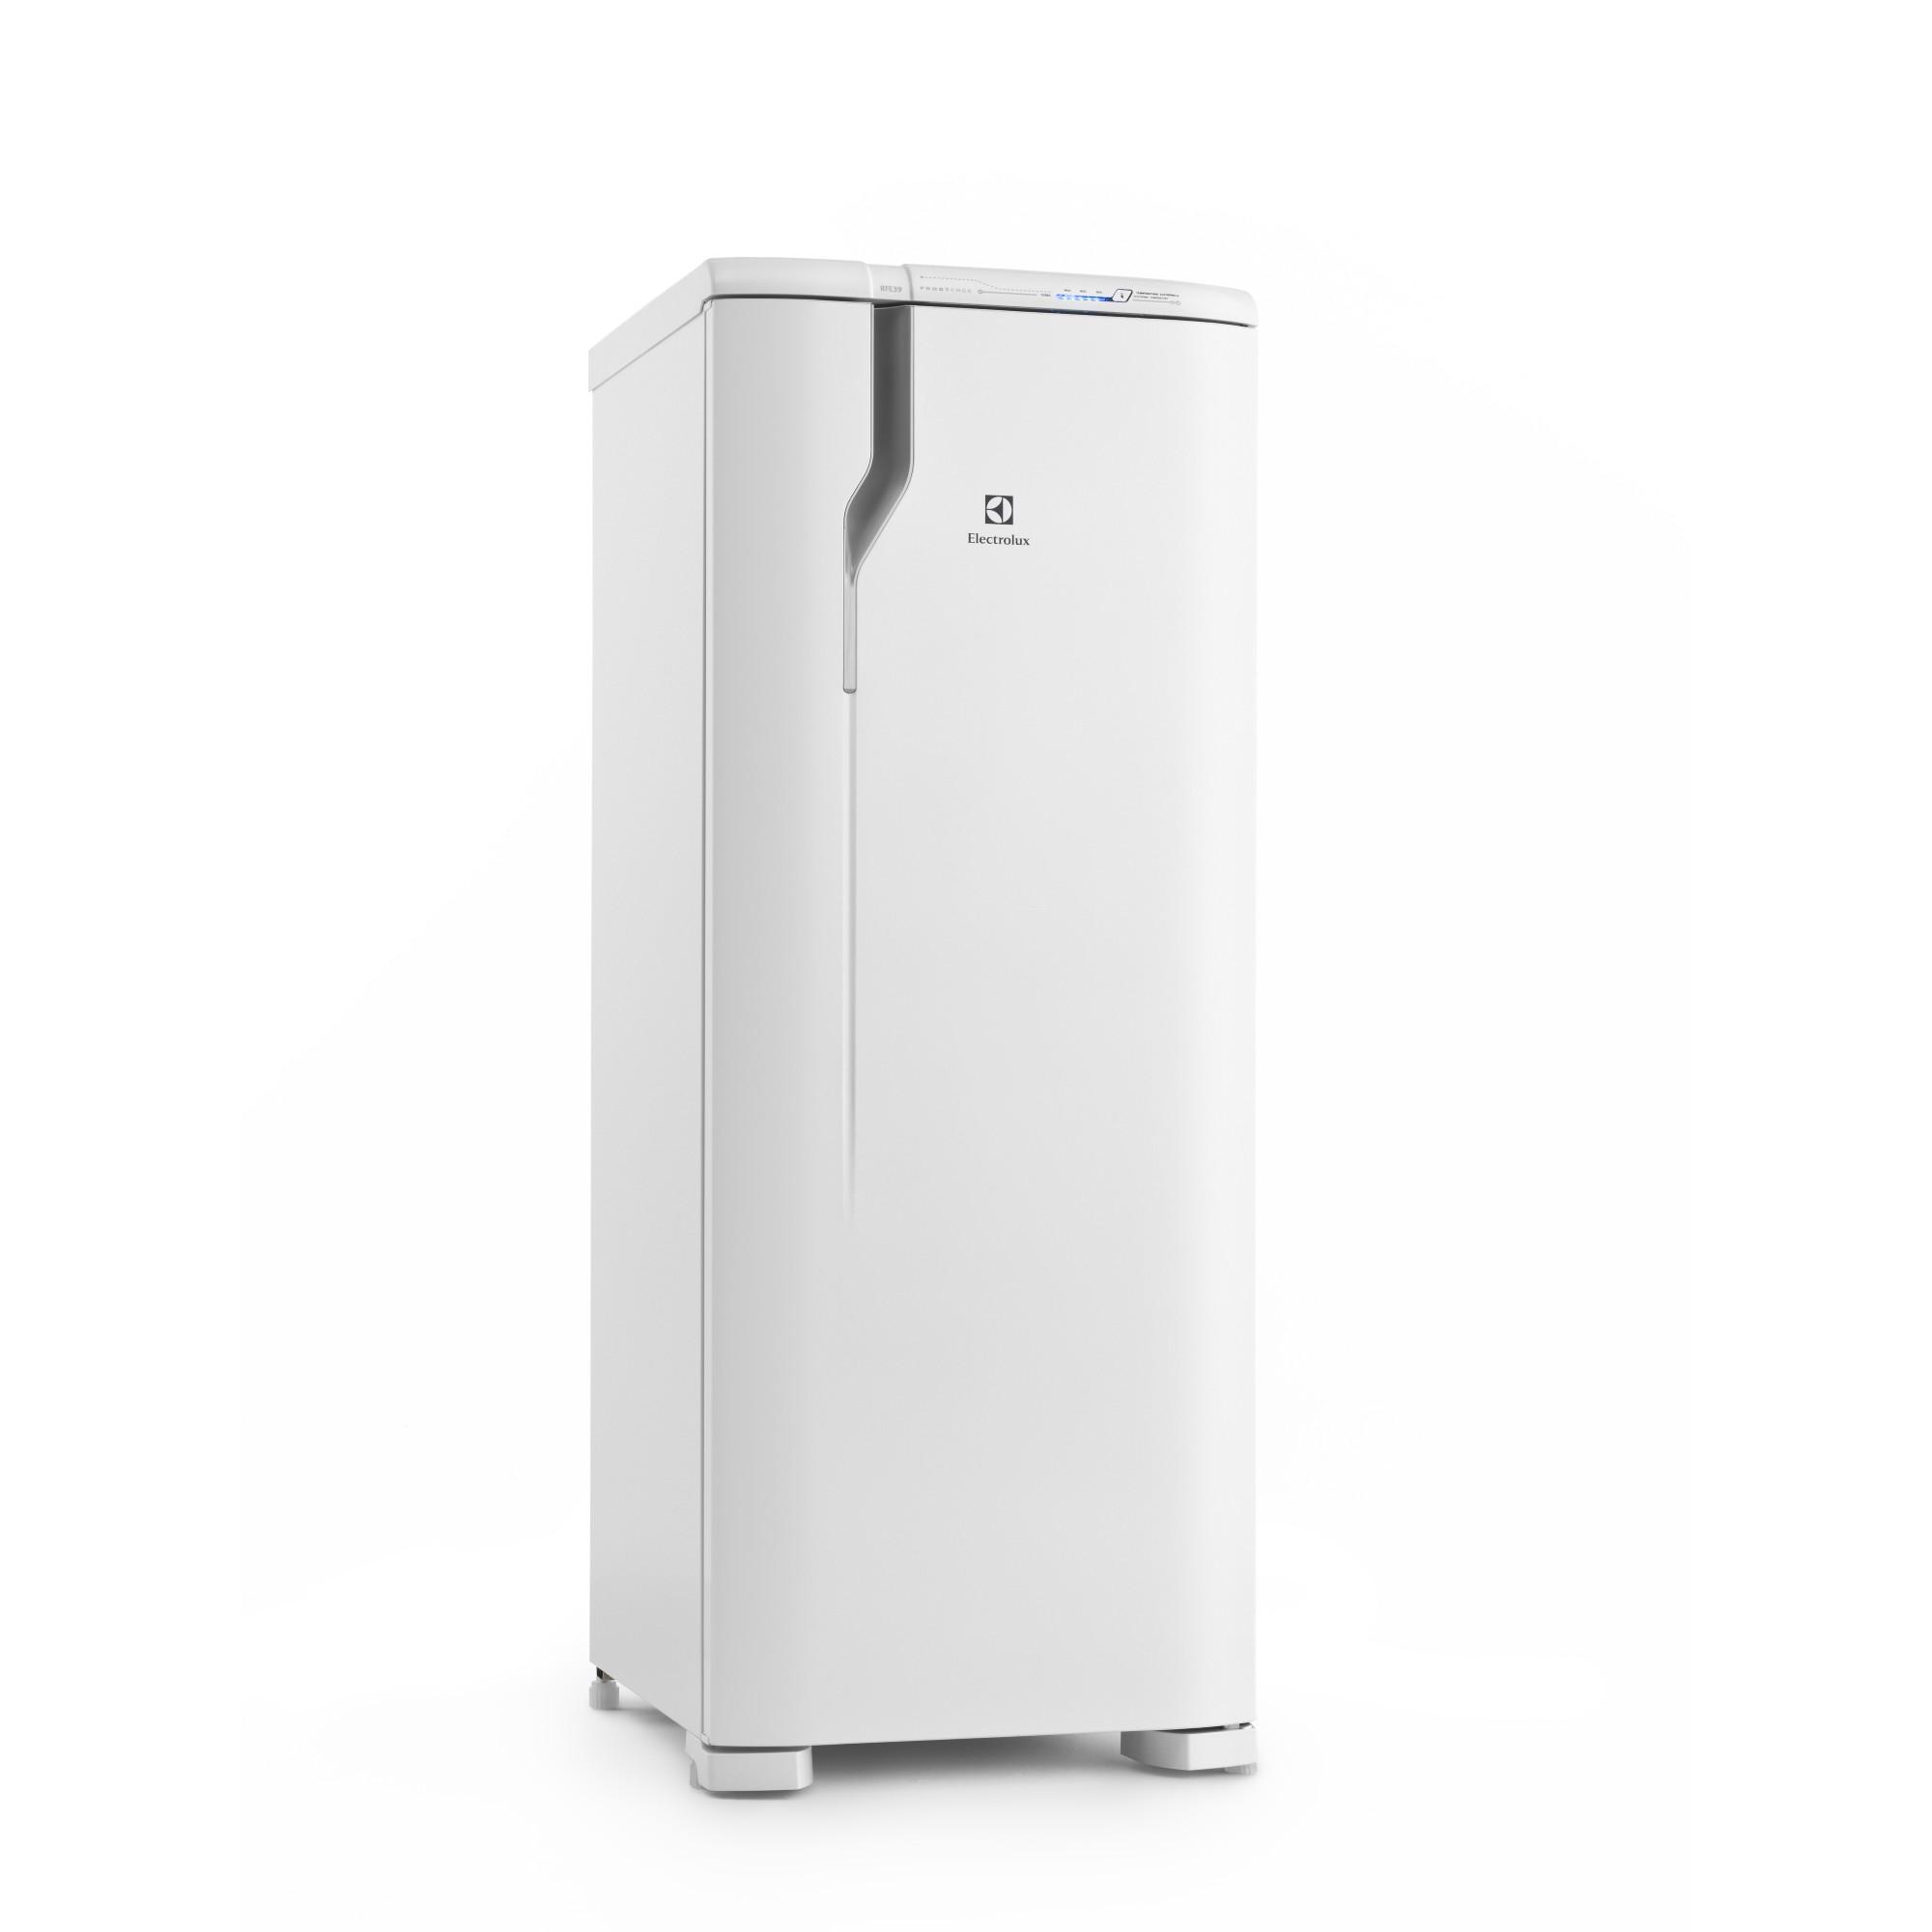 GeladeiraRefrigerador Electrolux Frost Free Branca 1 Porta 322L 127V - RFE39